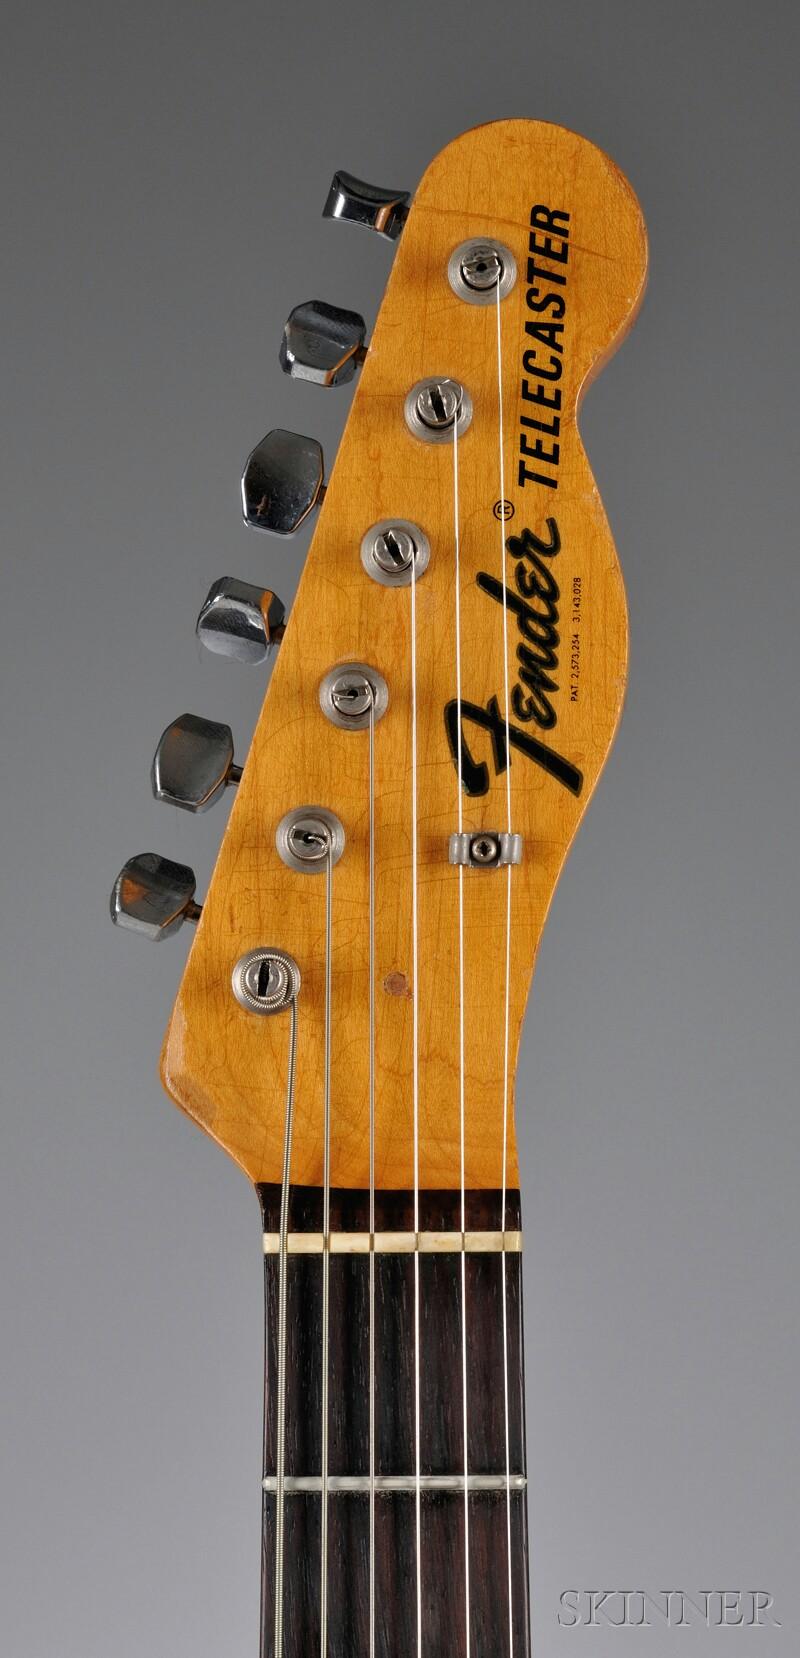 American Electric Guitar, Fender Musical Instruments, Santa Ana, 1967, Model   Telecaster Custom,